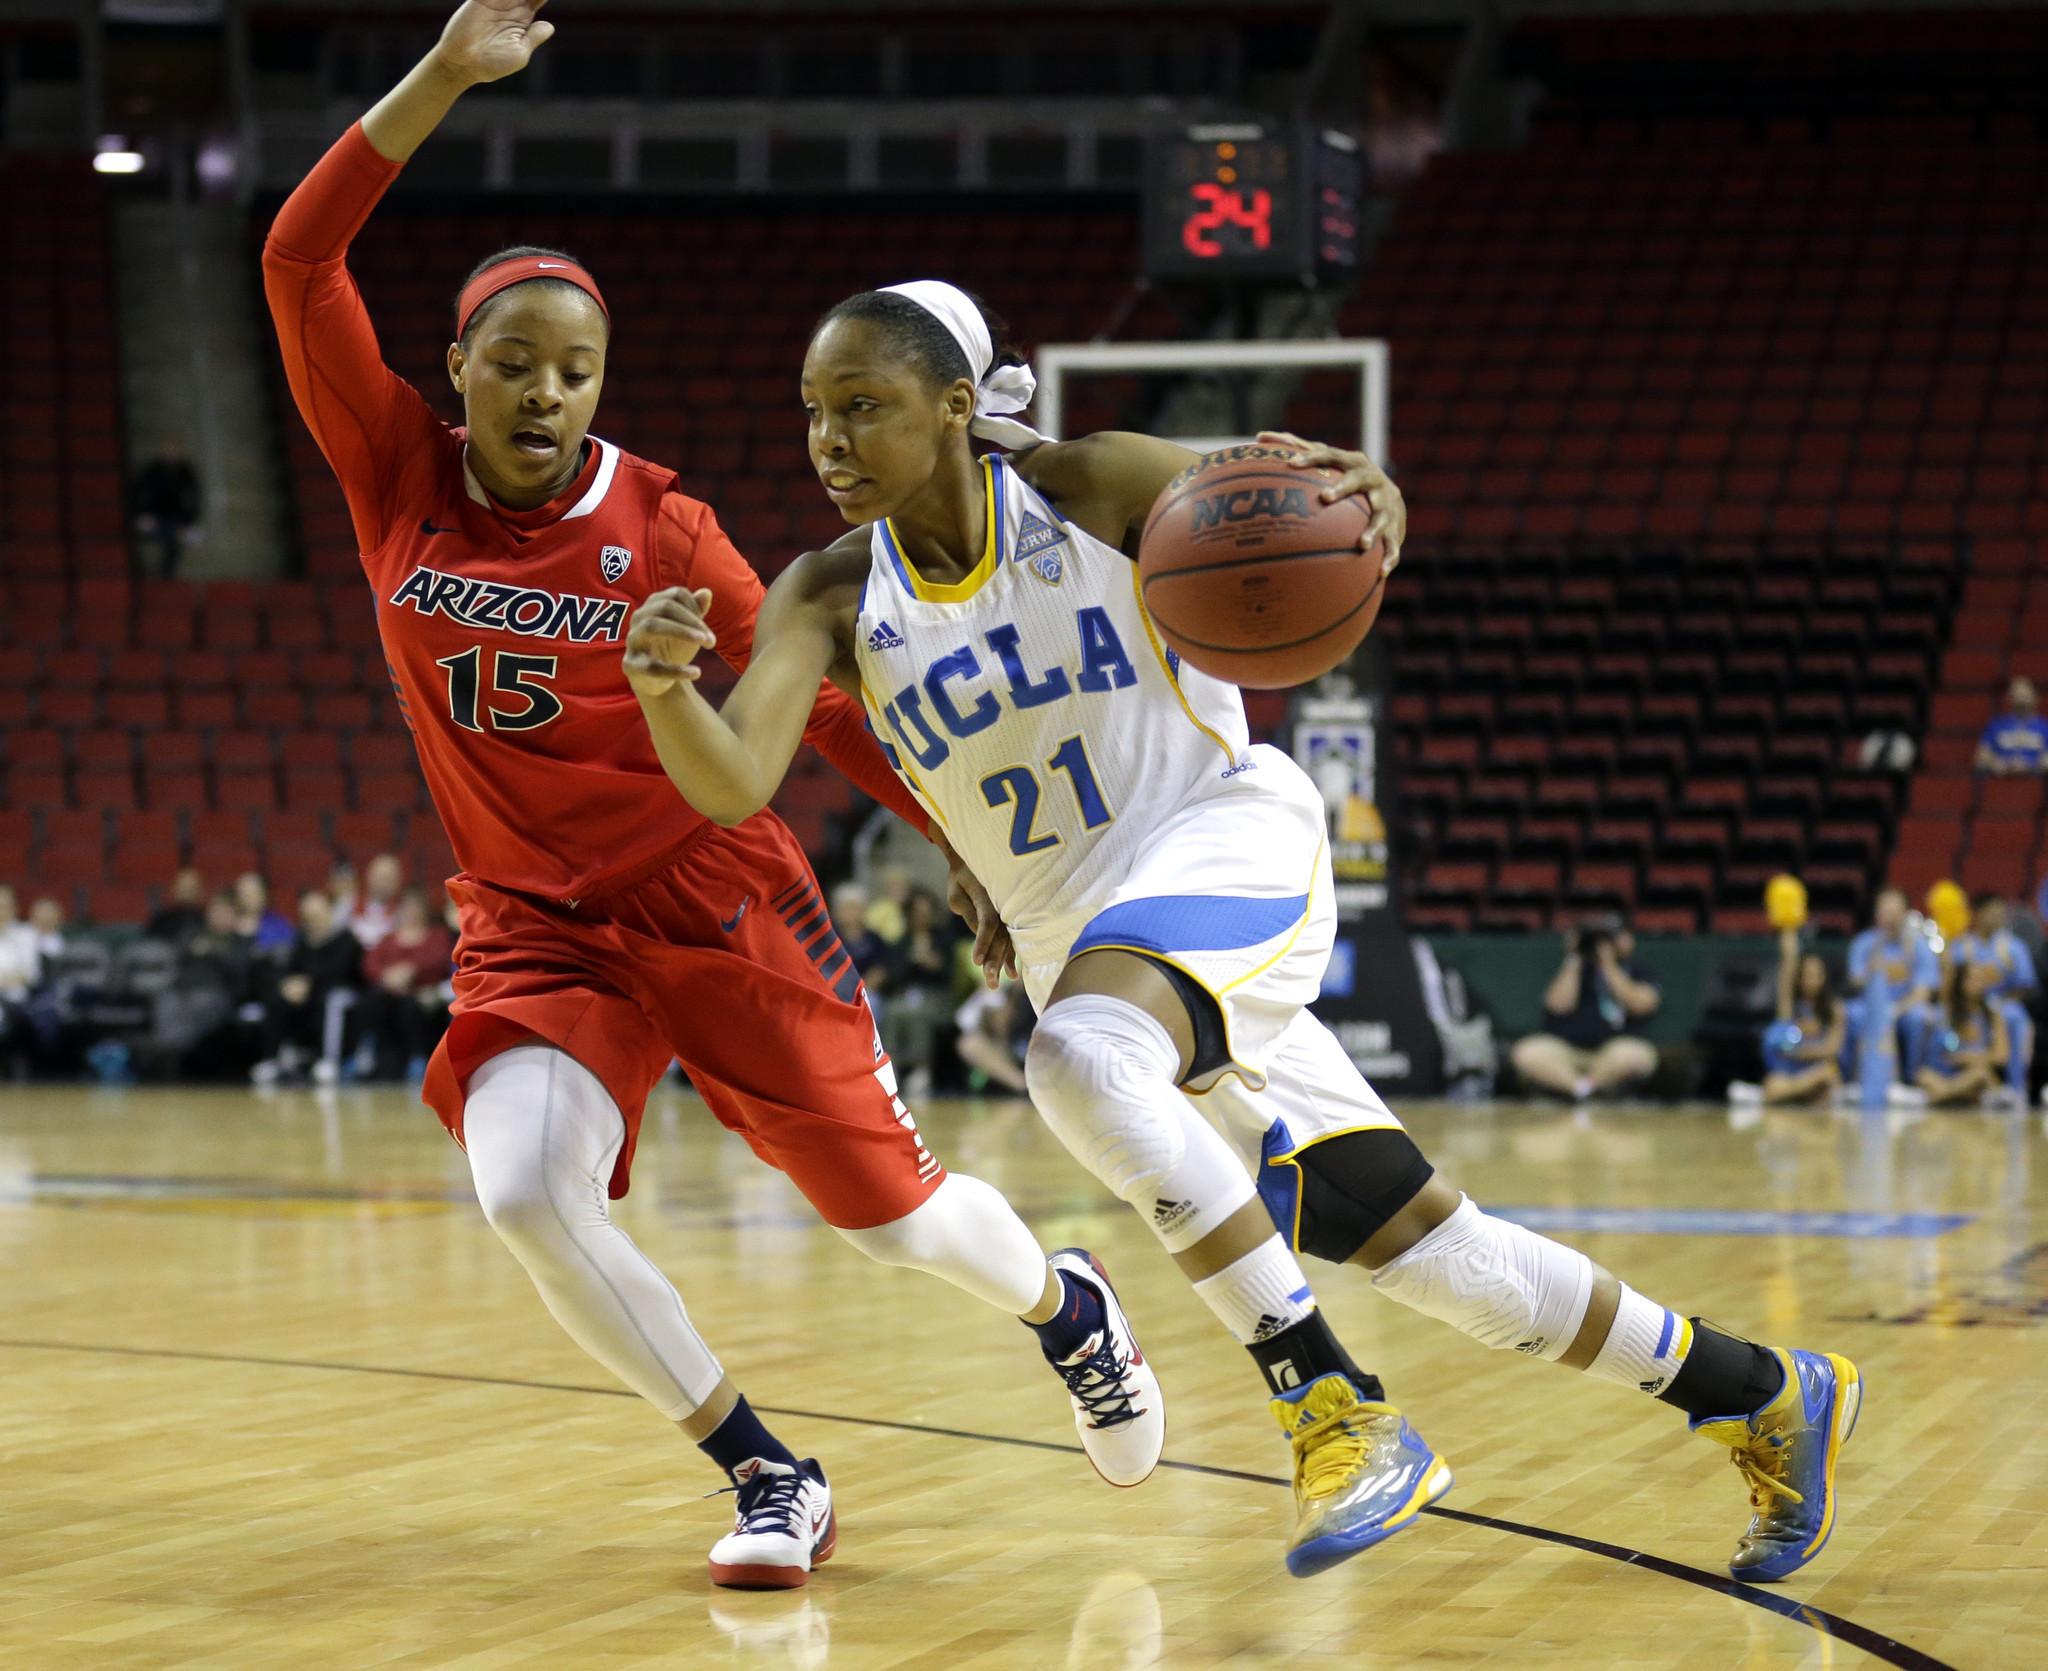 UCLA women advance in Pac-12 tournament with 80-62 win over Arizona